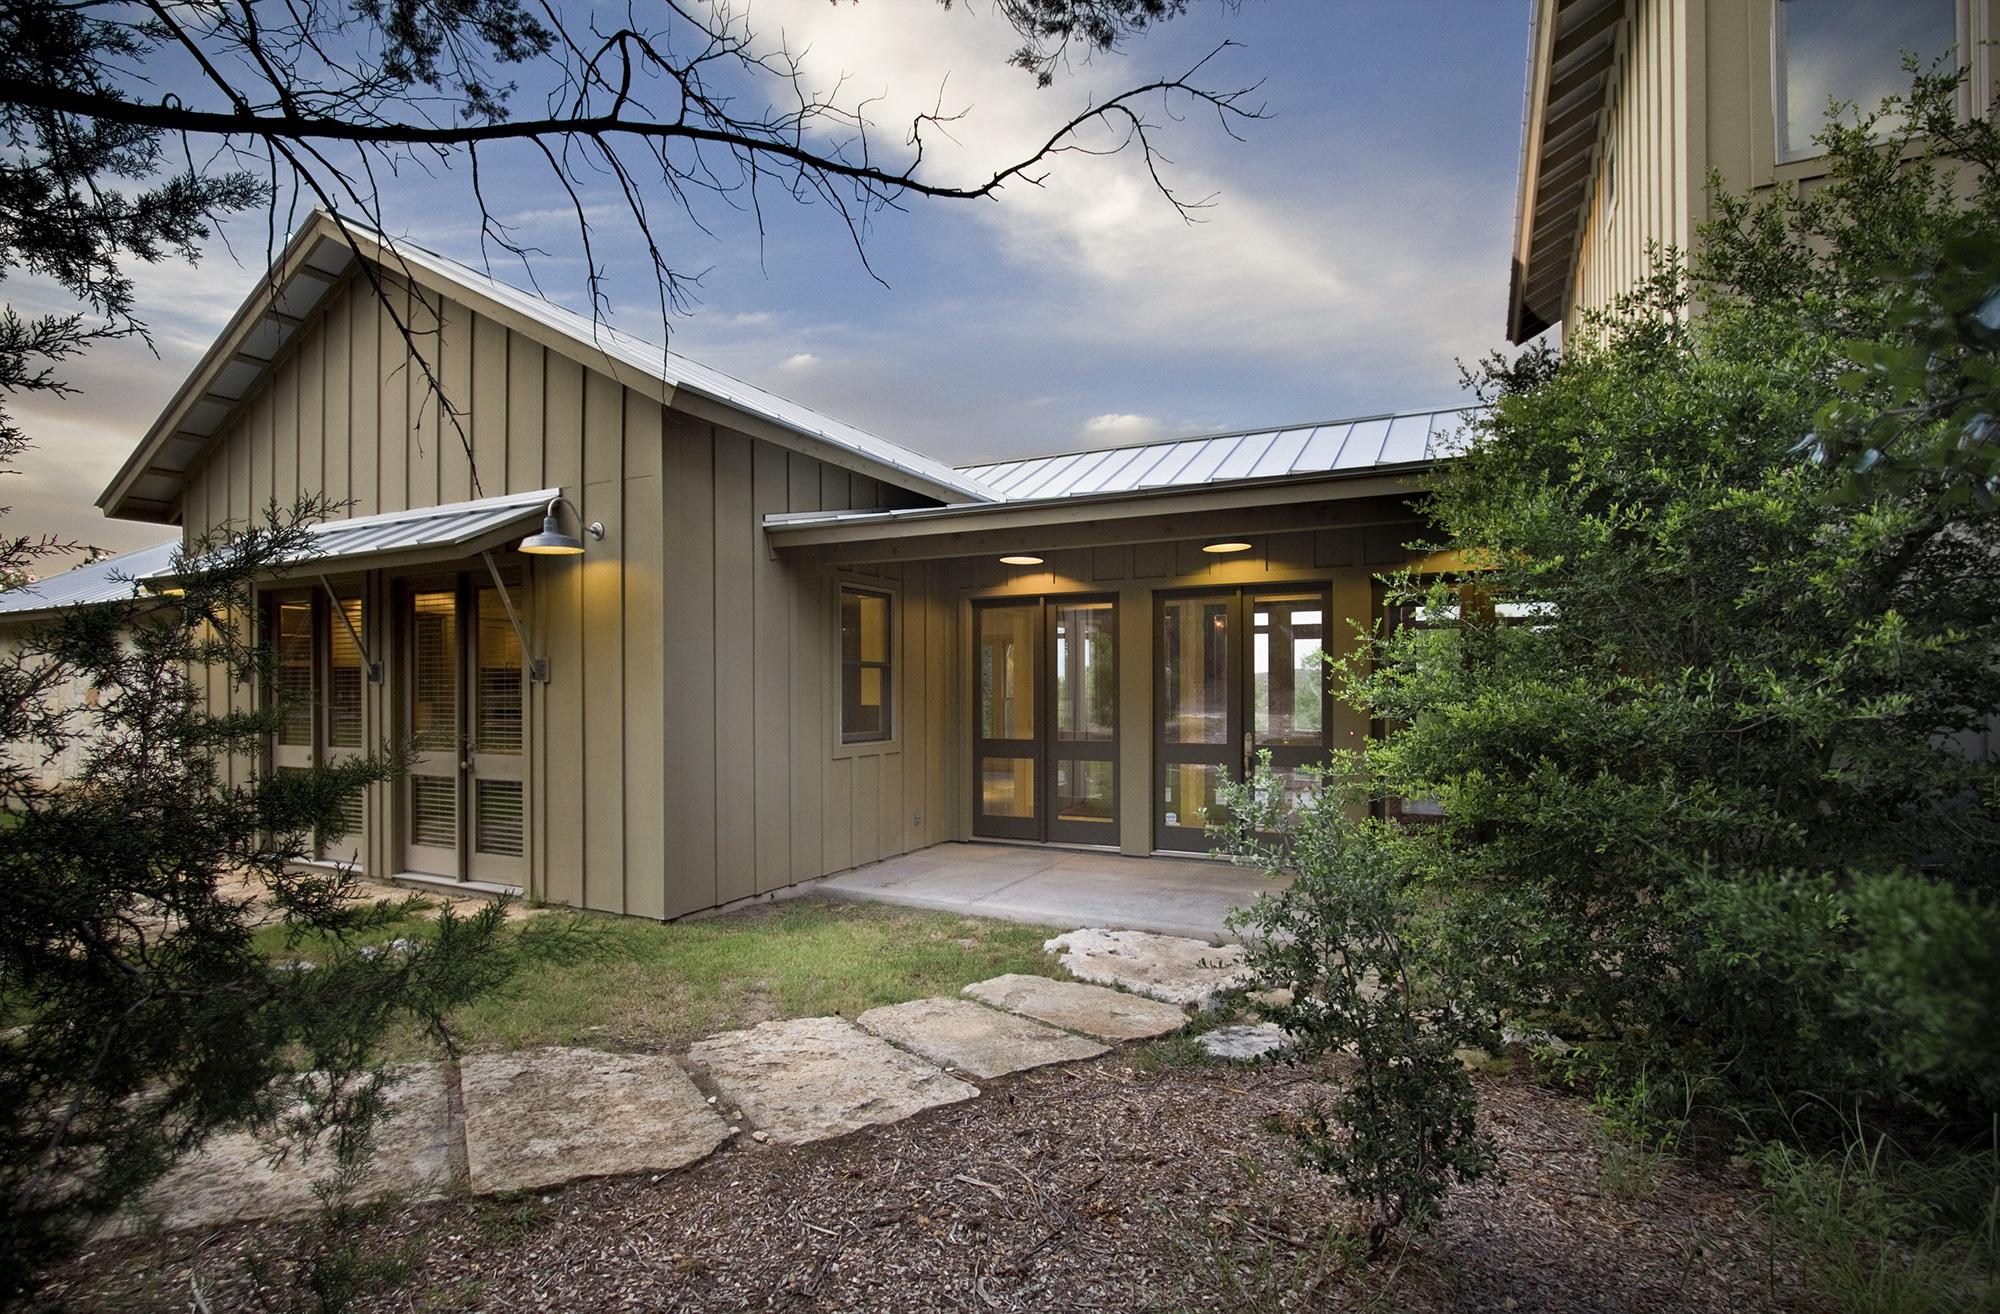 Best Kitchen Gallery: Westlake Eanes Isd Home For Rent We Love Austin of Modern Homes Austin Tx  on rachelxblog.com